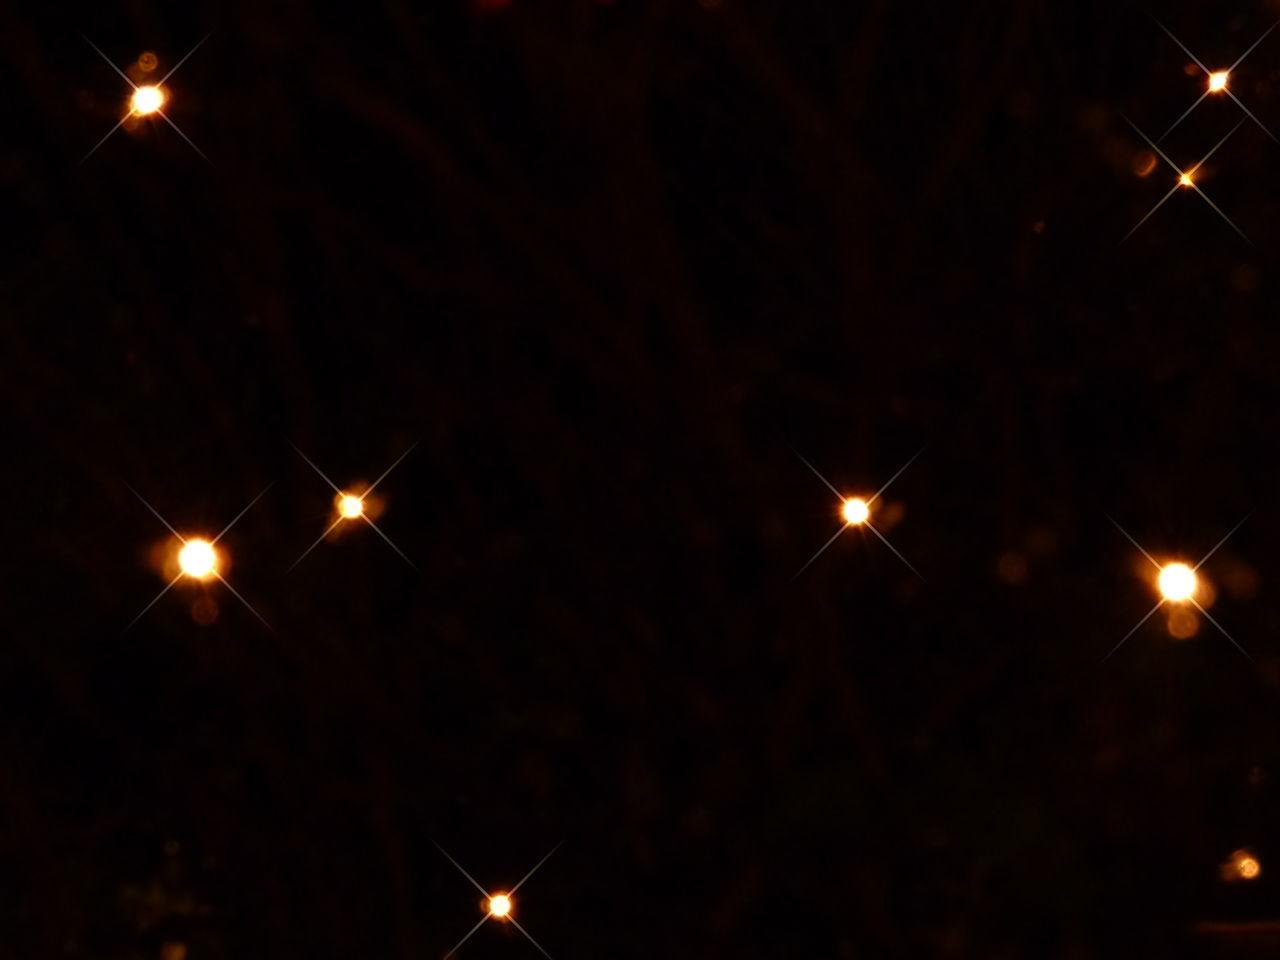 illuminated, night, lighting equipment, street light, moon, electricity, low angle view, no people, outdoors, spotlight, close-up, sky